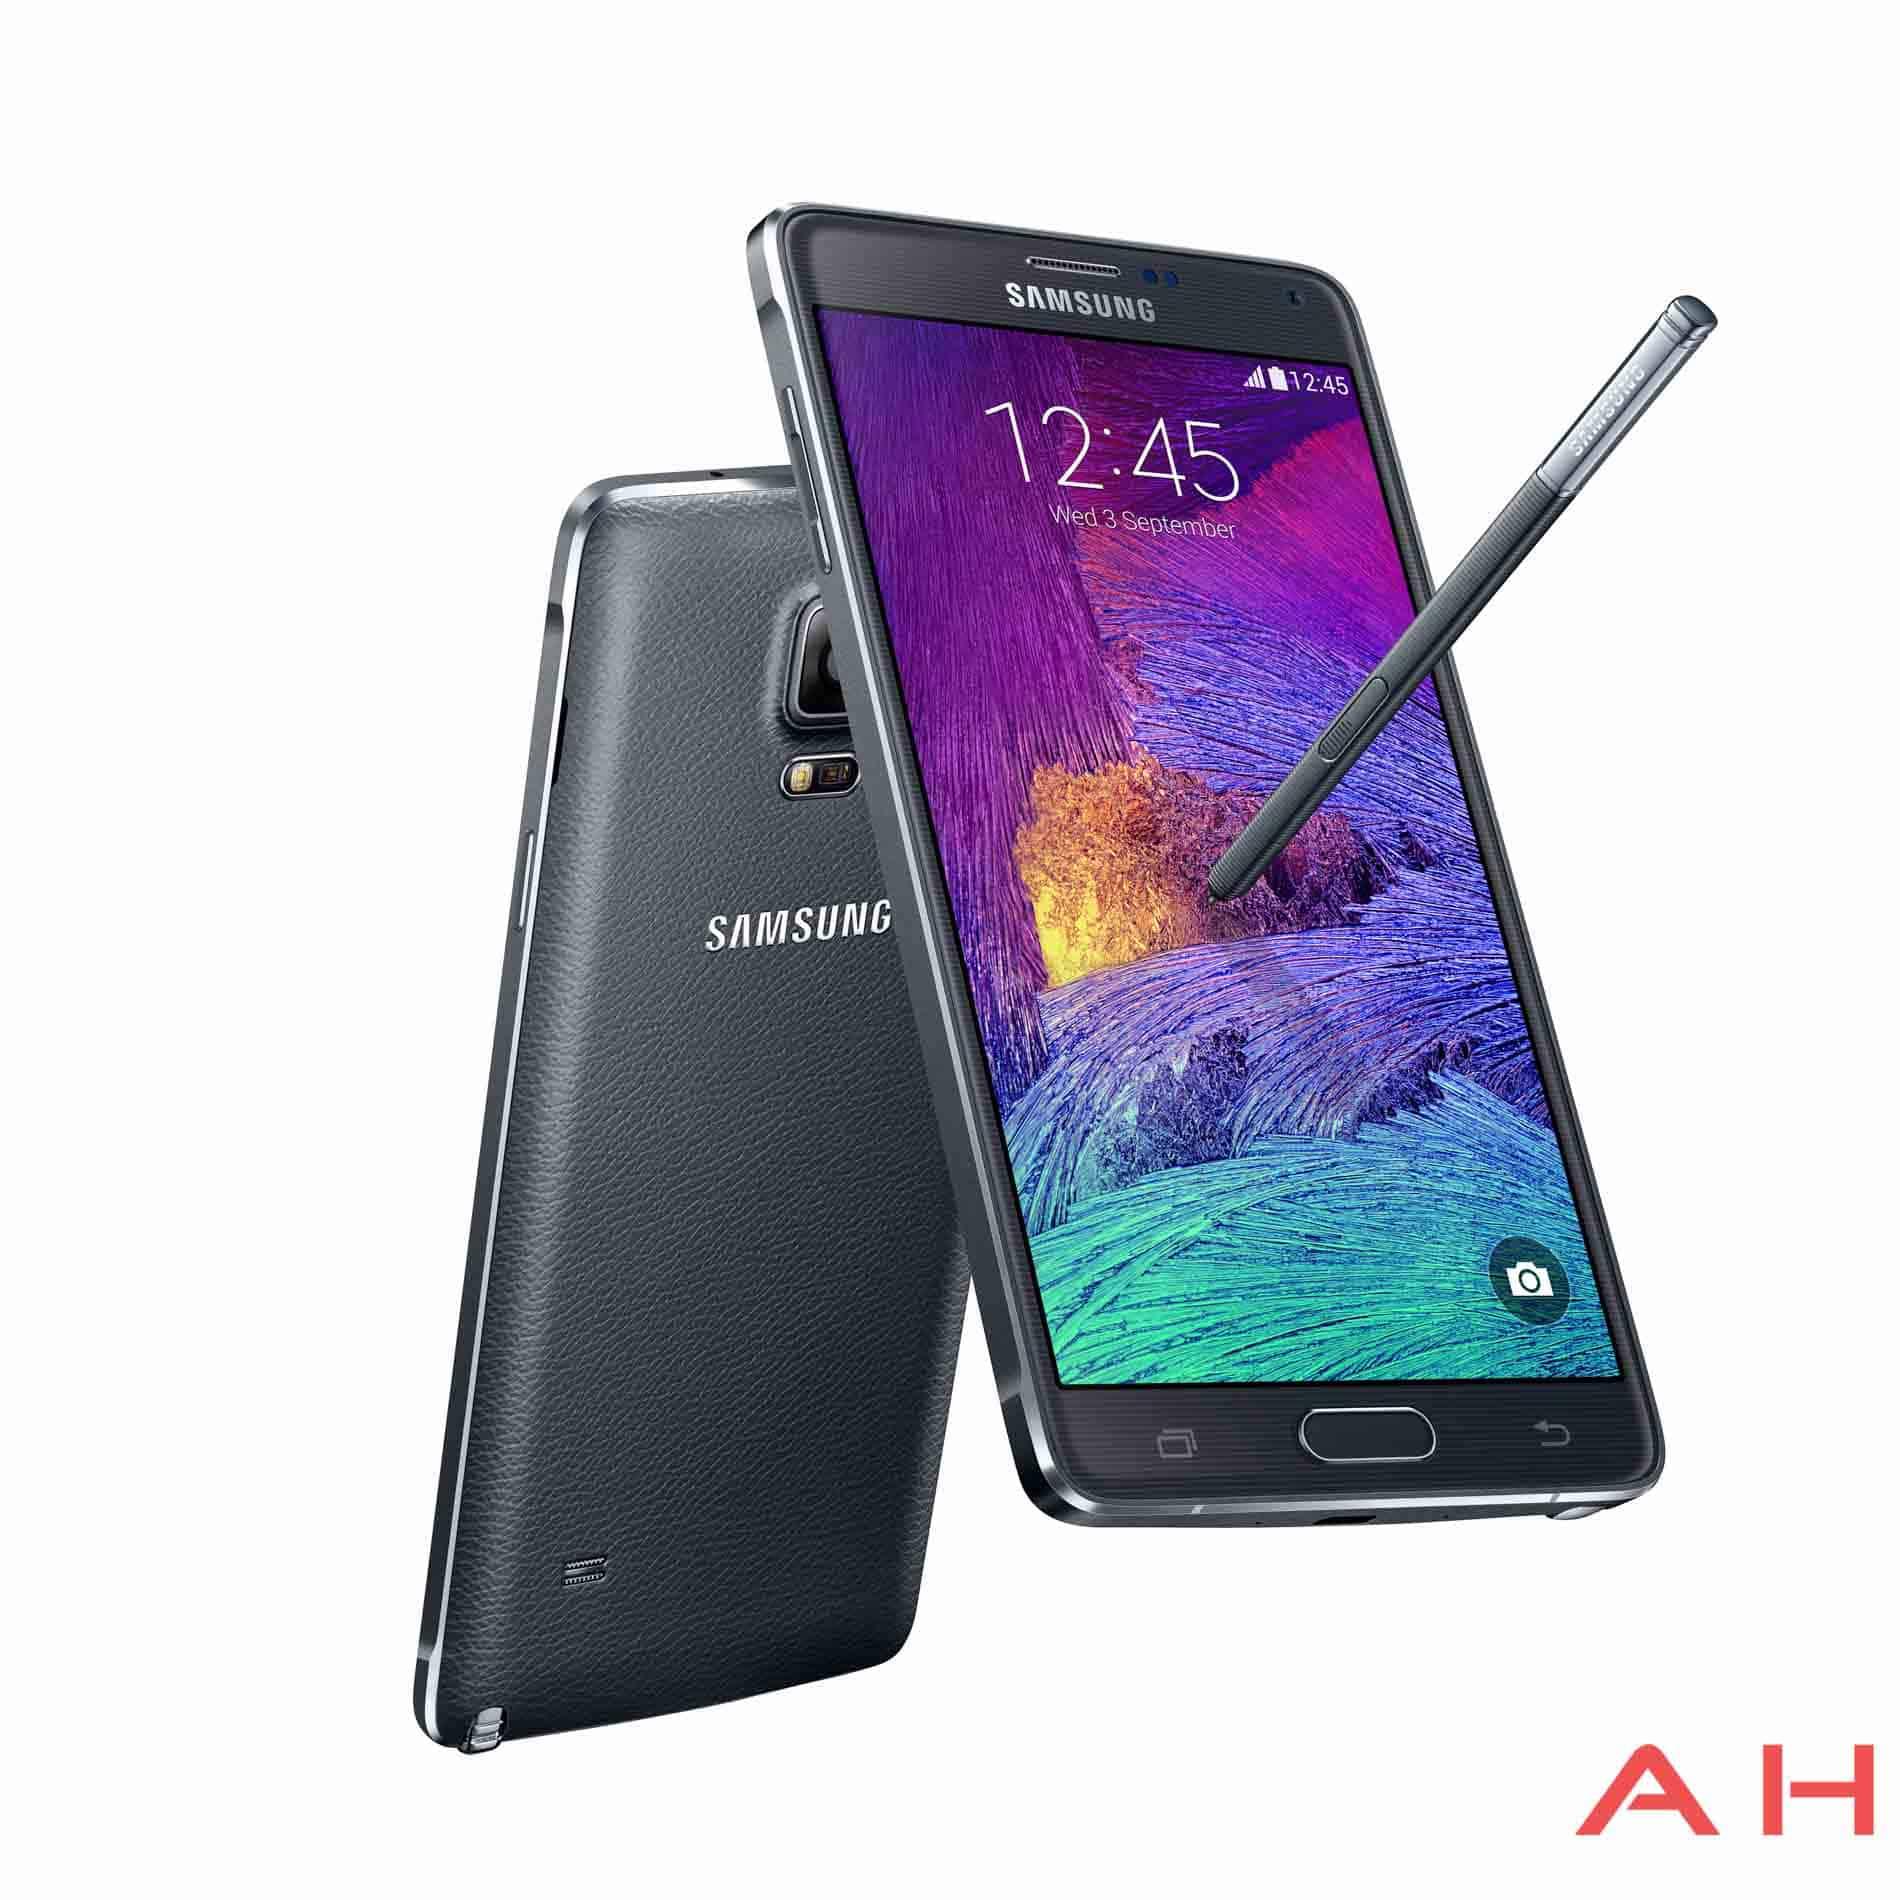 Samsung-Galaxy-Note-4-AH-1